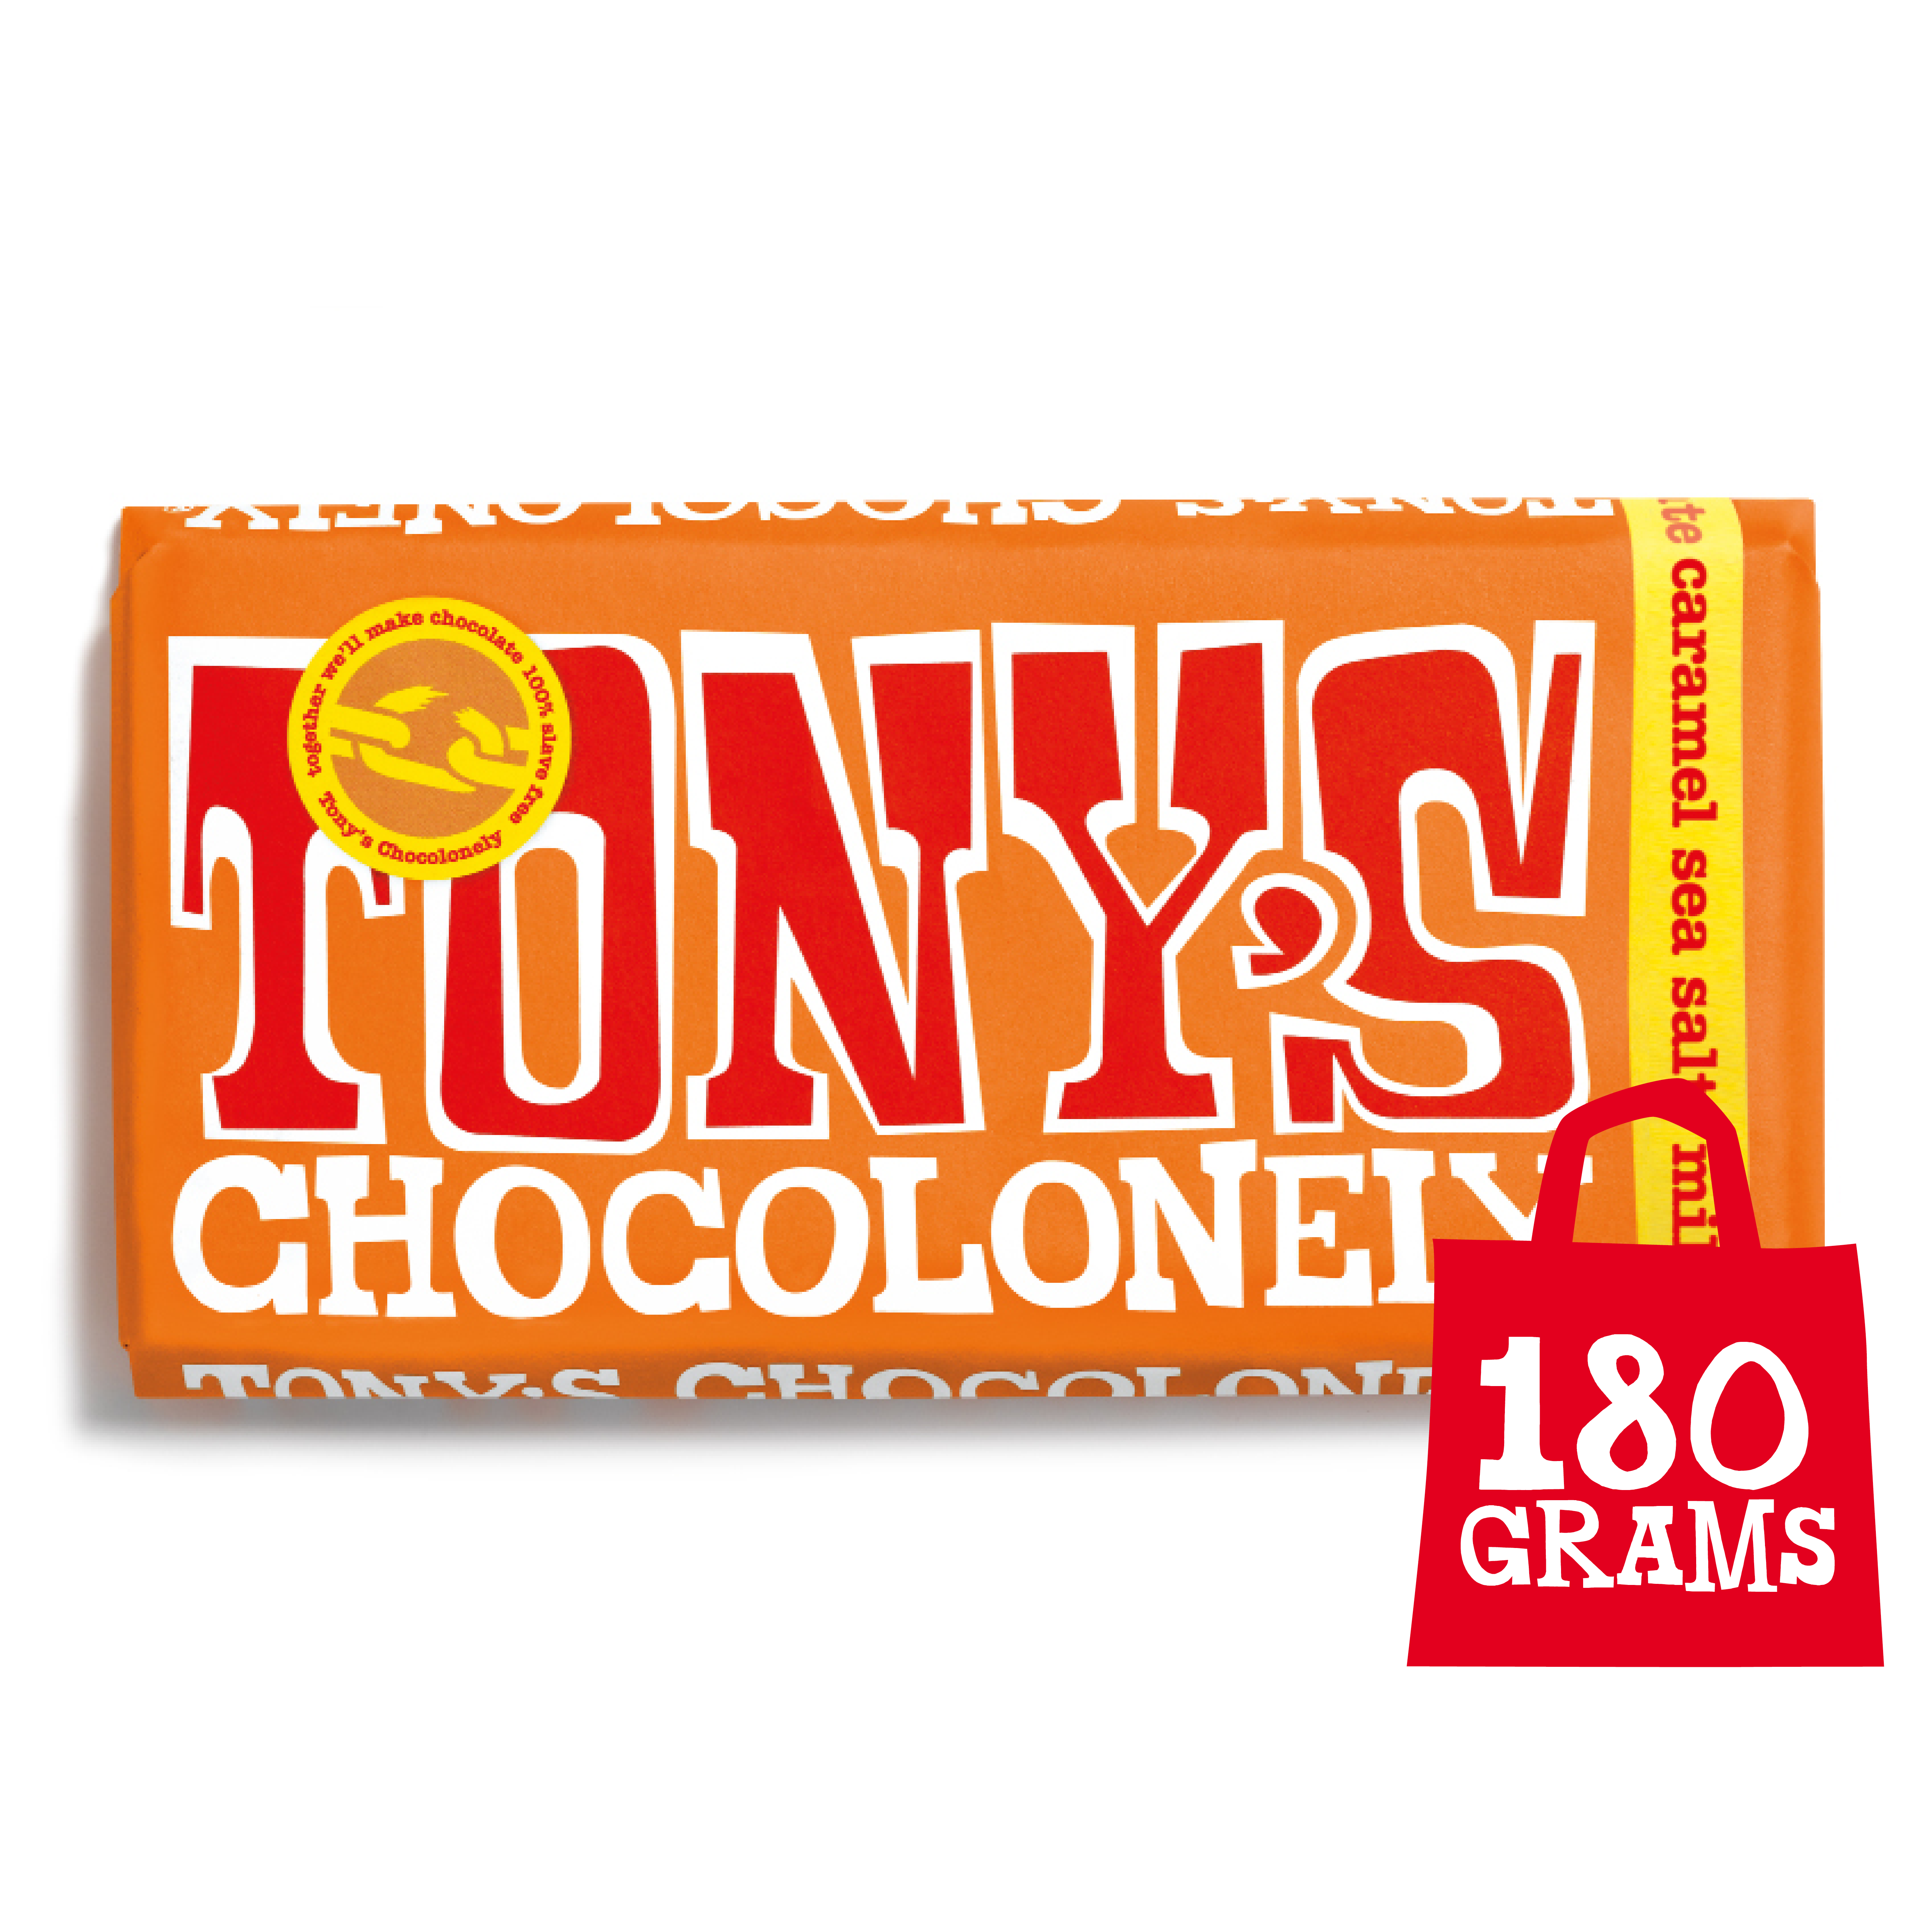 Milk Caramel Sea Salt 32% | Tony's Chocolonely